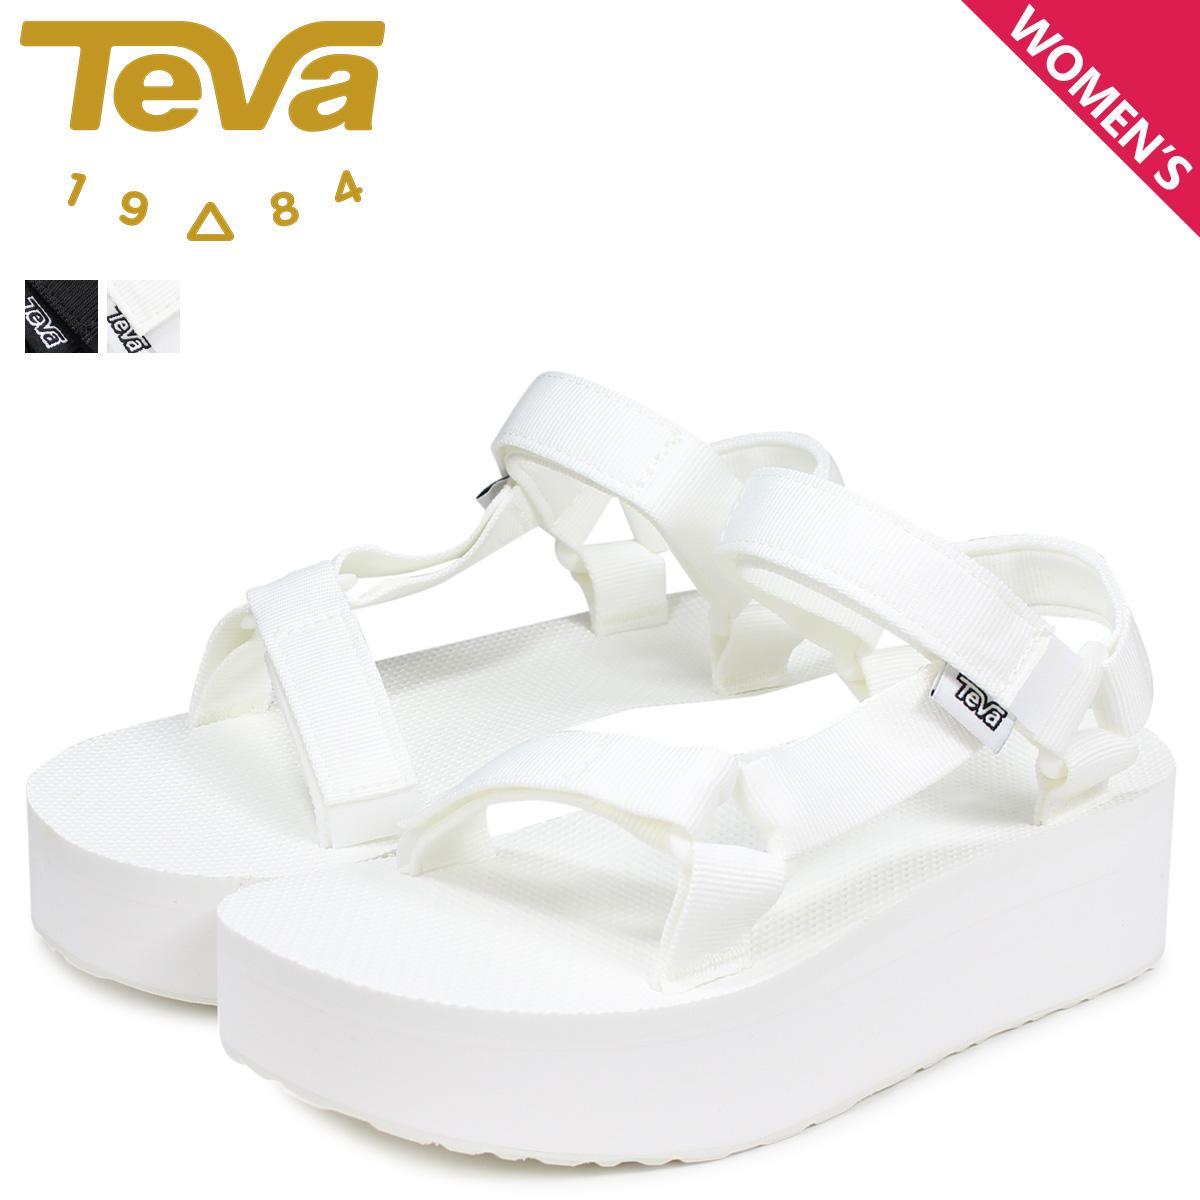 53344761d6d3 Teva Teva sandals flat form universal Lady s thickness bottom W FLATFORM  UNIVERSAL black white black and white 1008844  load planned Shinnyu load in  ...